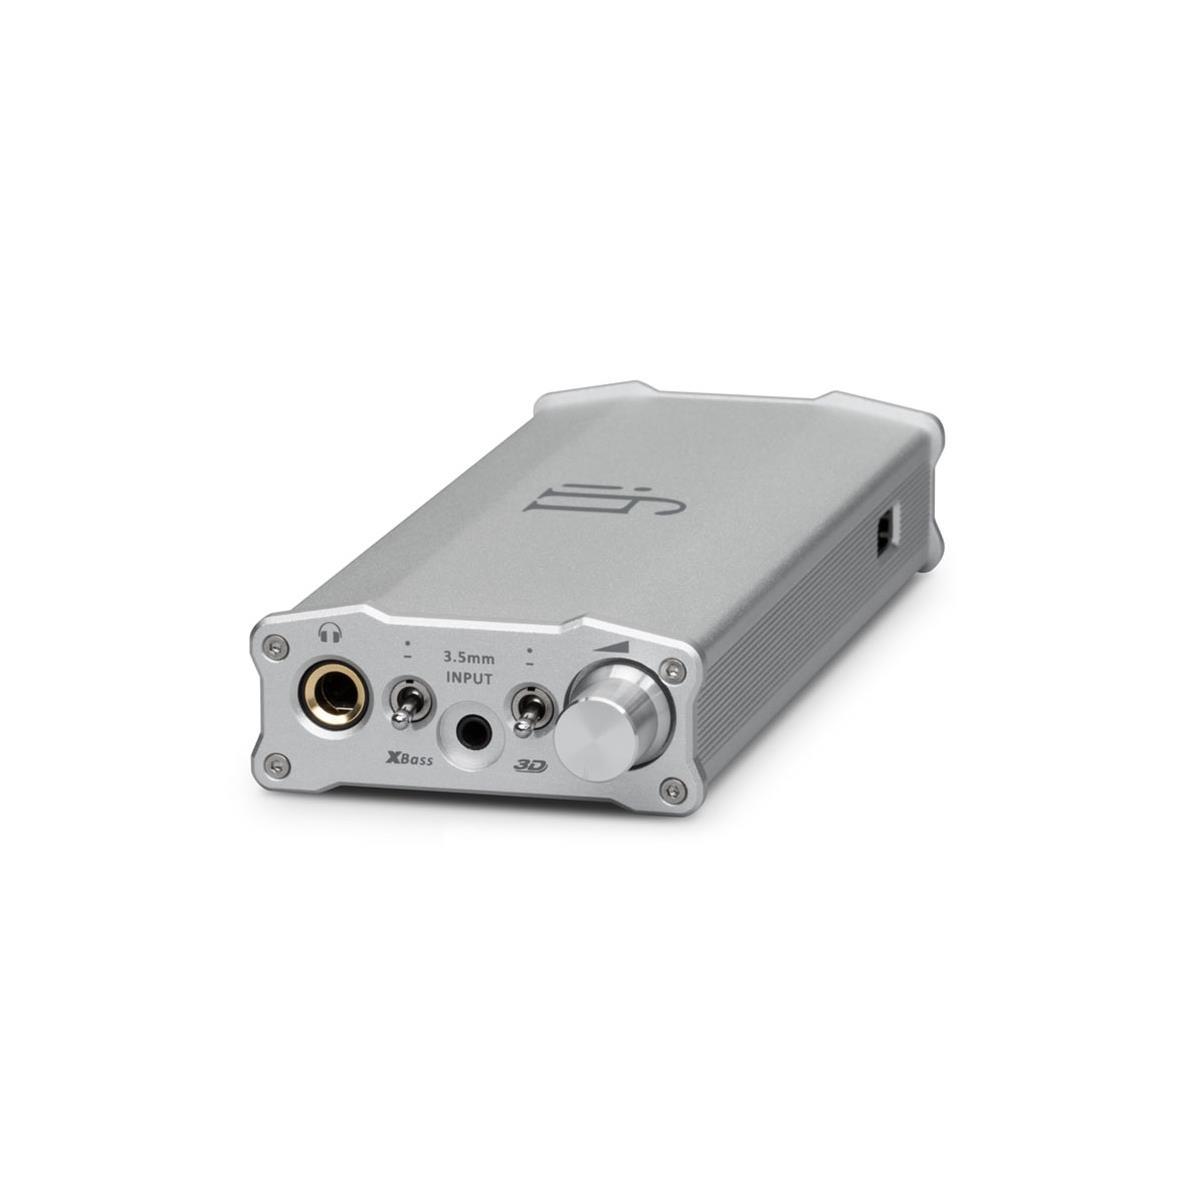 iFi Amp / Dac Sale: Micro iDSD $379, iCAN SE $250, Nano iDSD $150 + free shipping